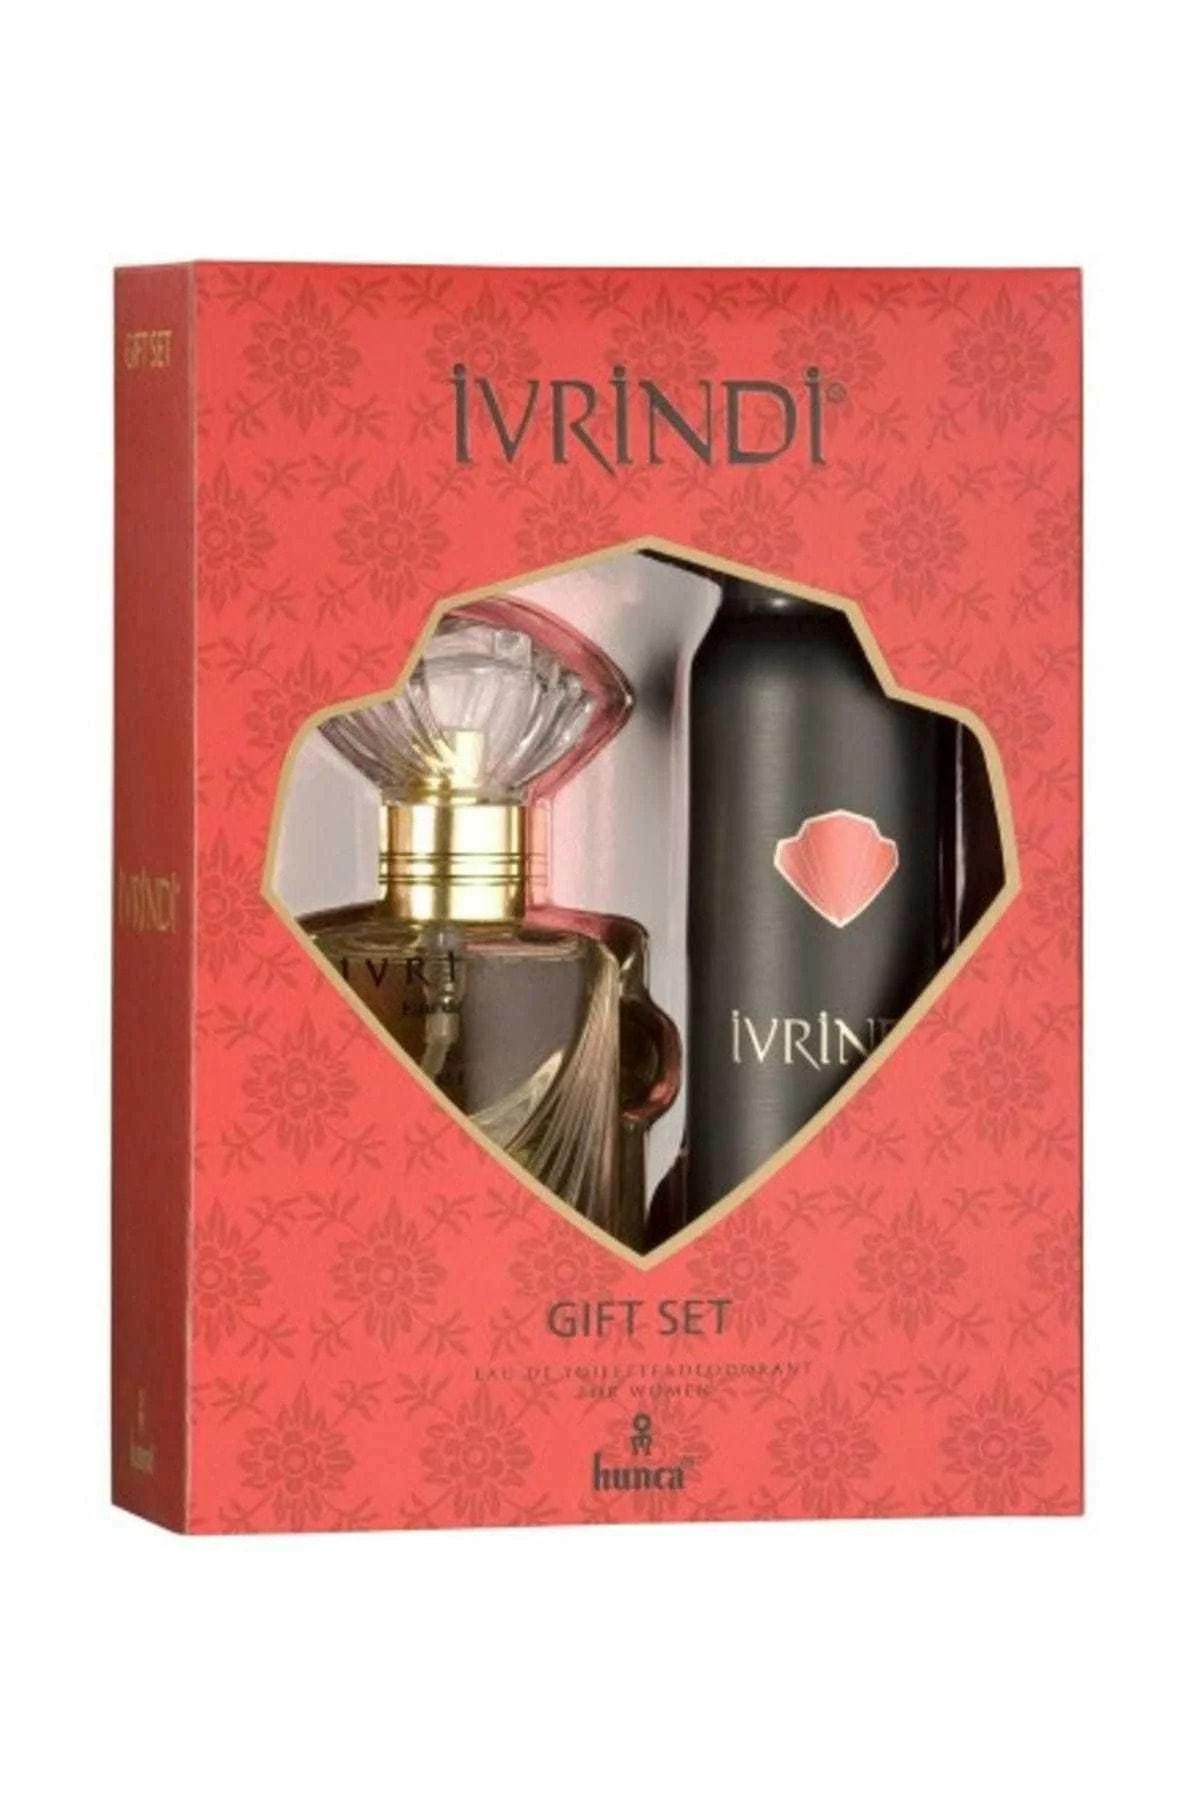 Ivrindi Edt 55 ml+ Deodorant 150 mlKadın Parfüm Seti 1